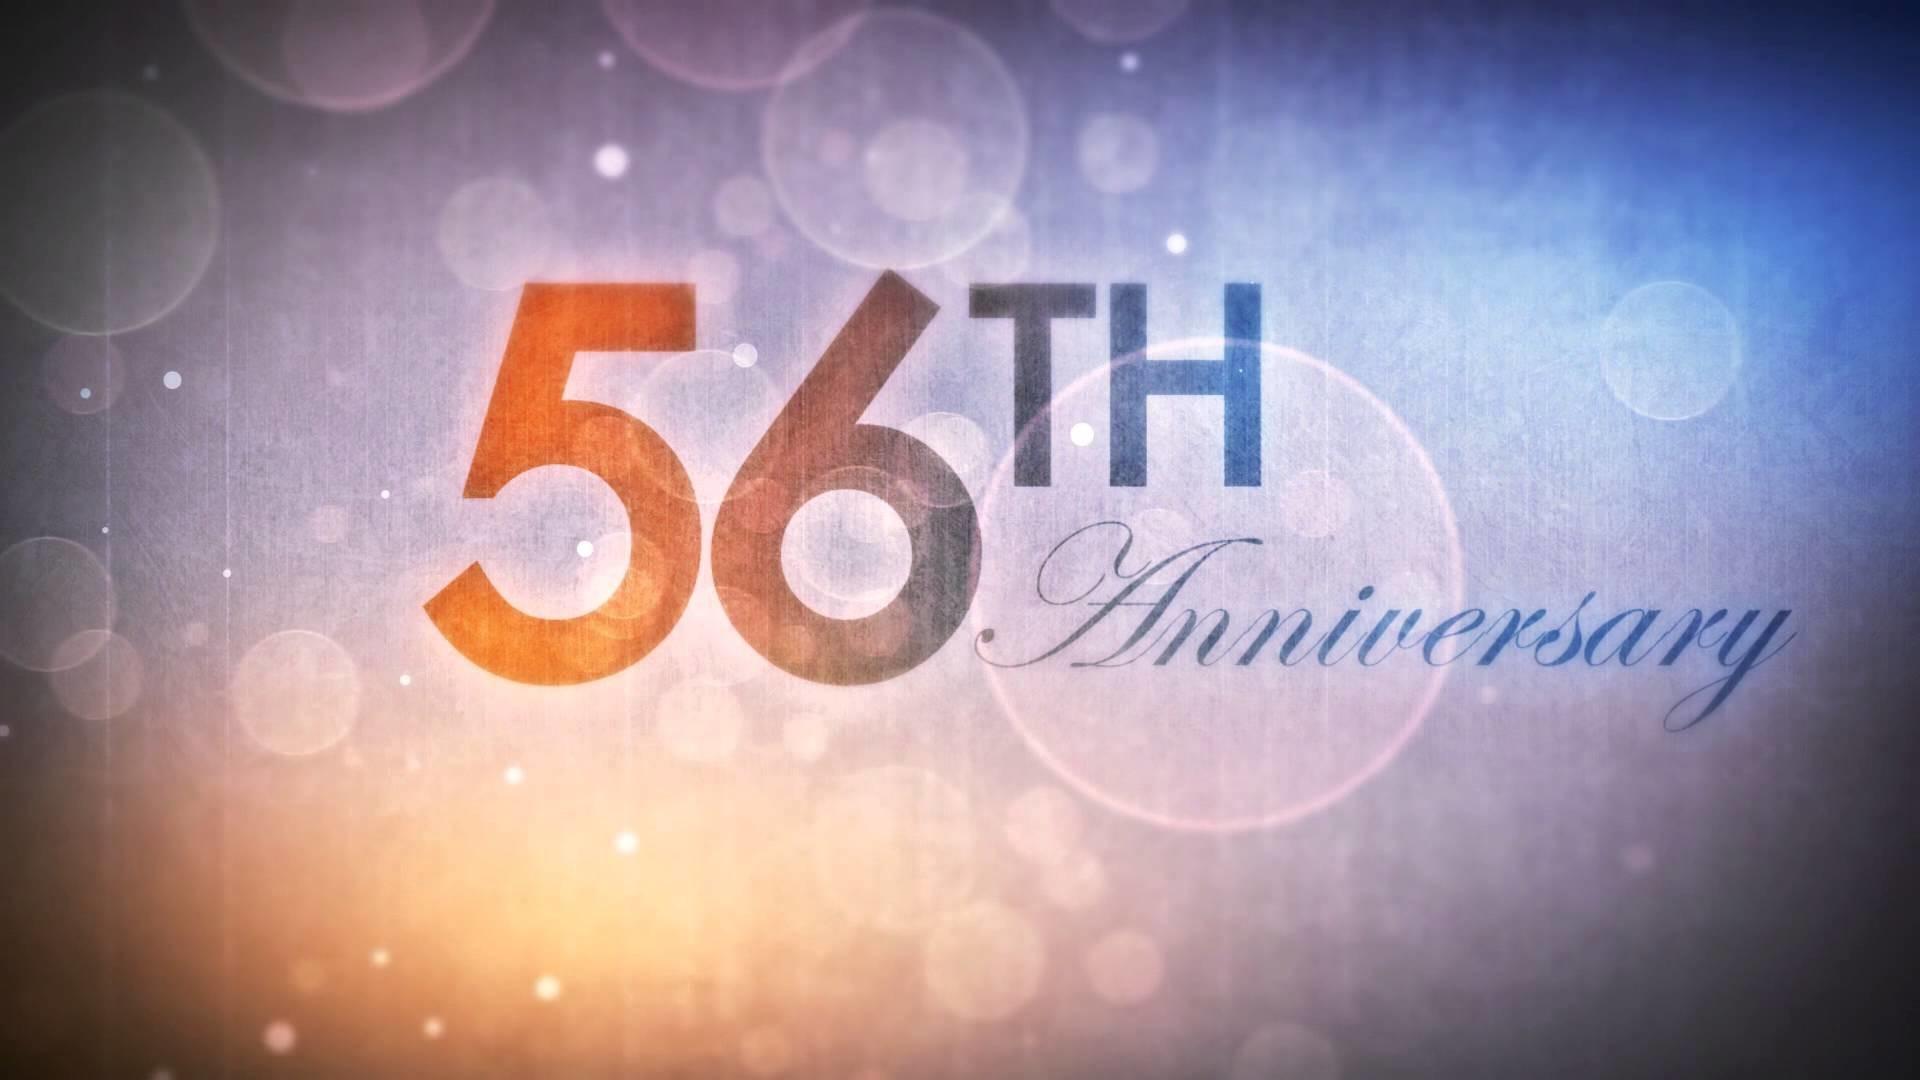 The Fountain of Praise: 56th Anniversary Celebration